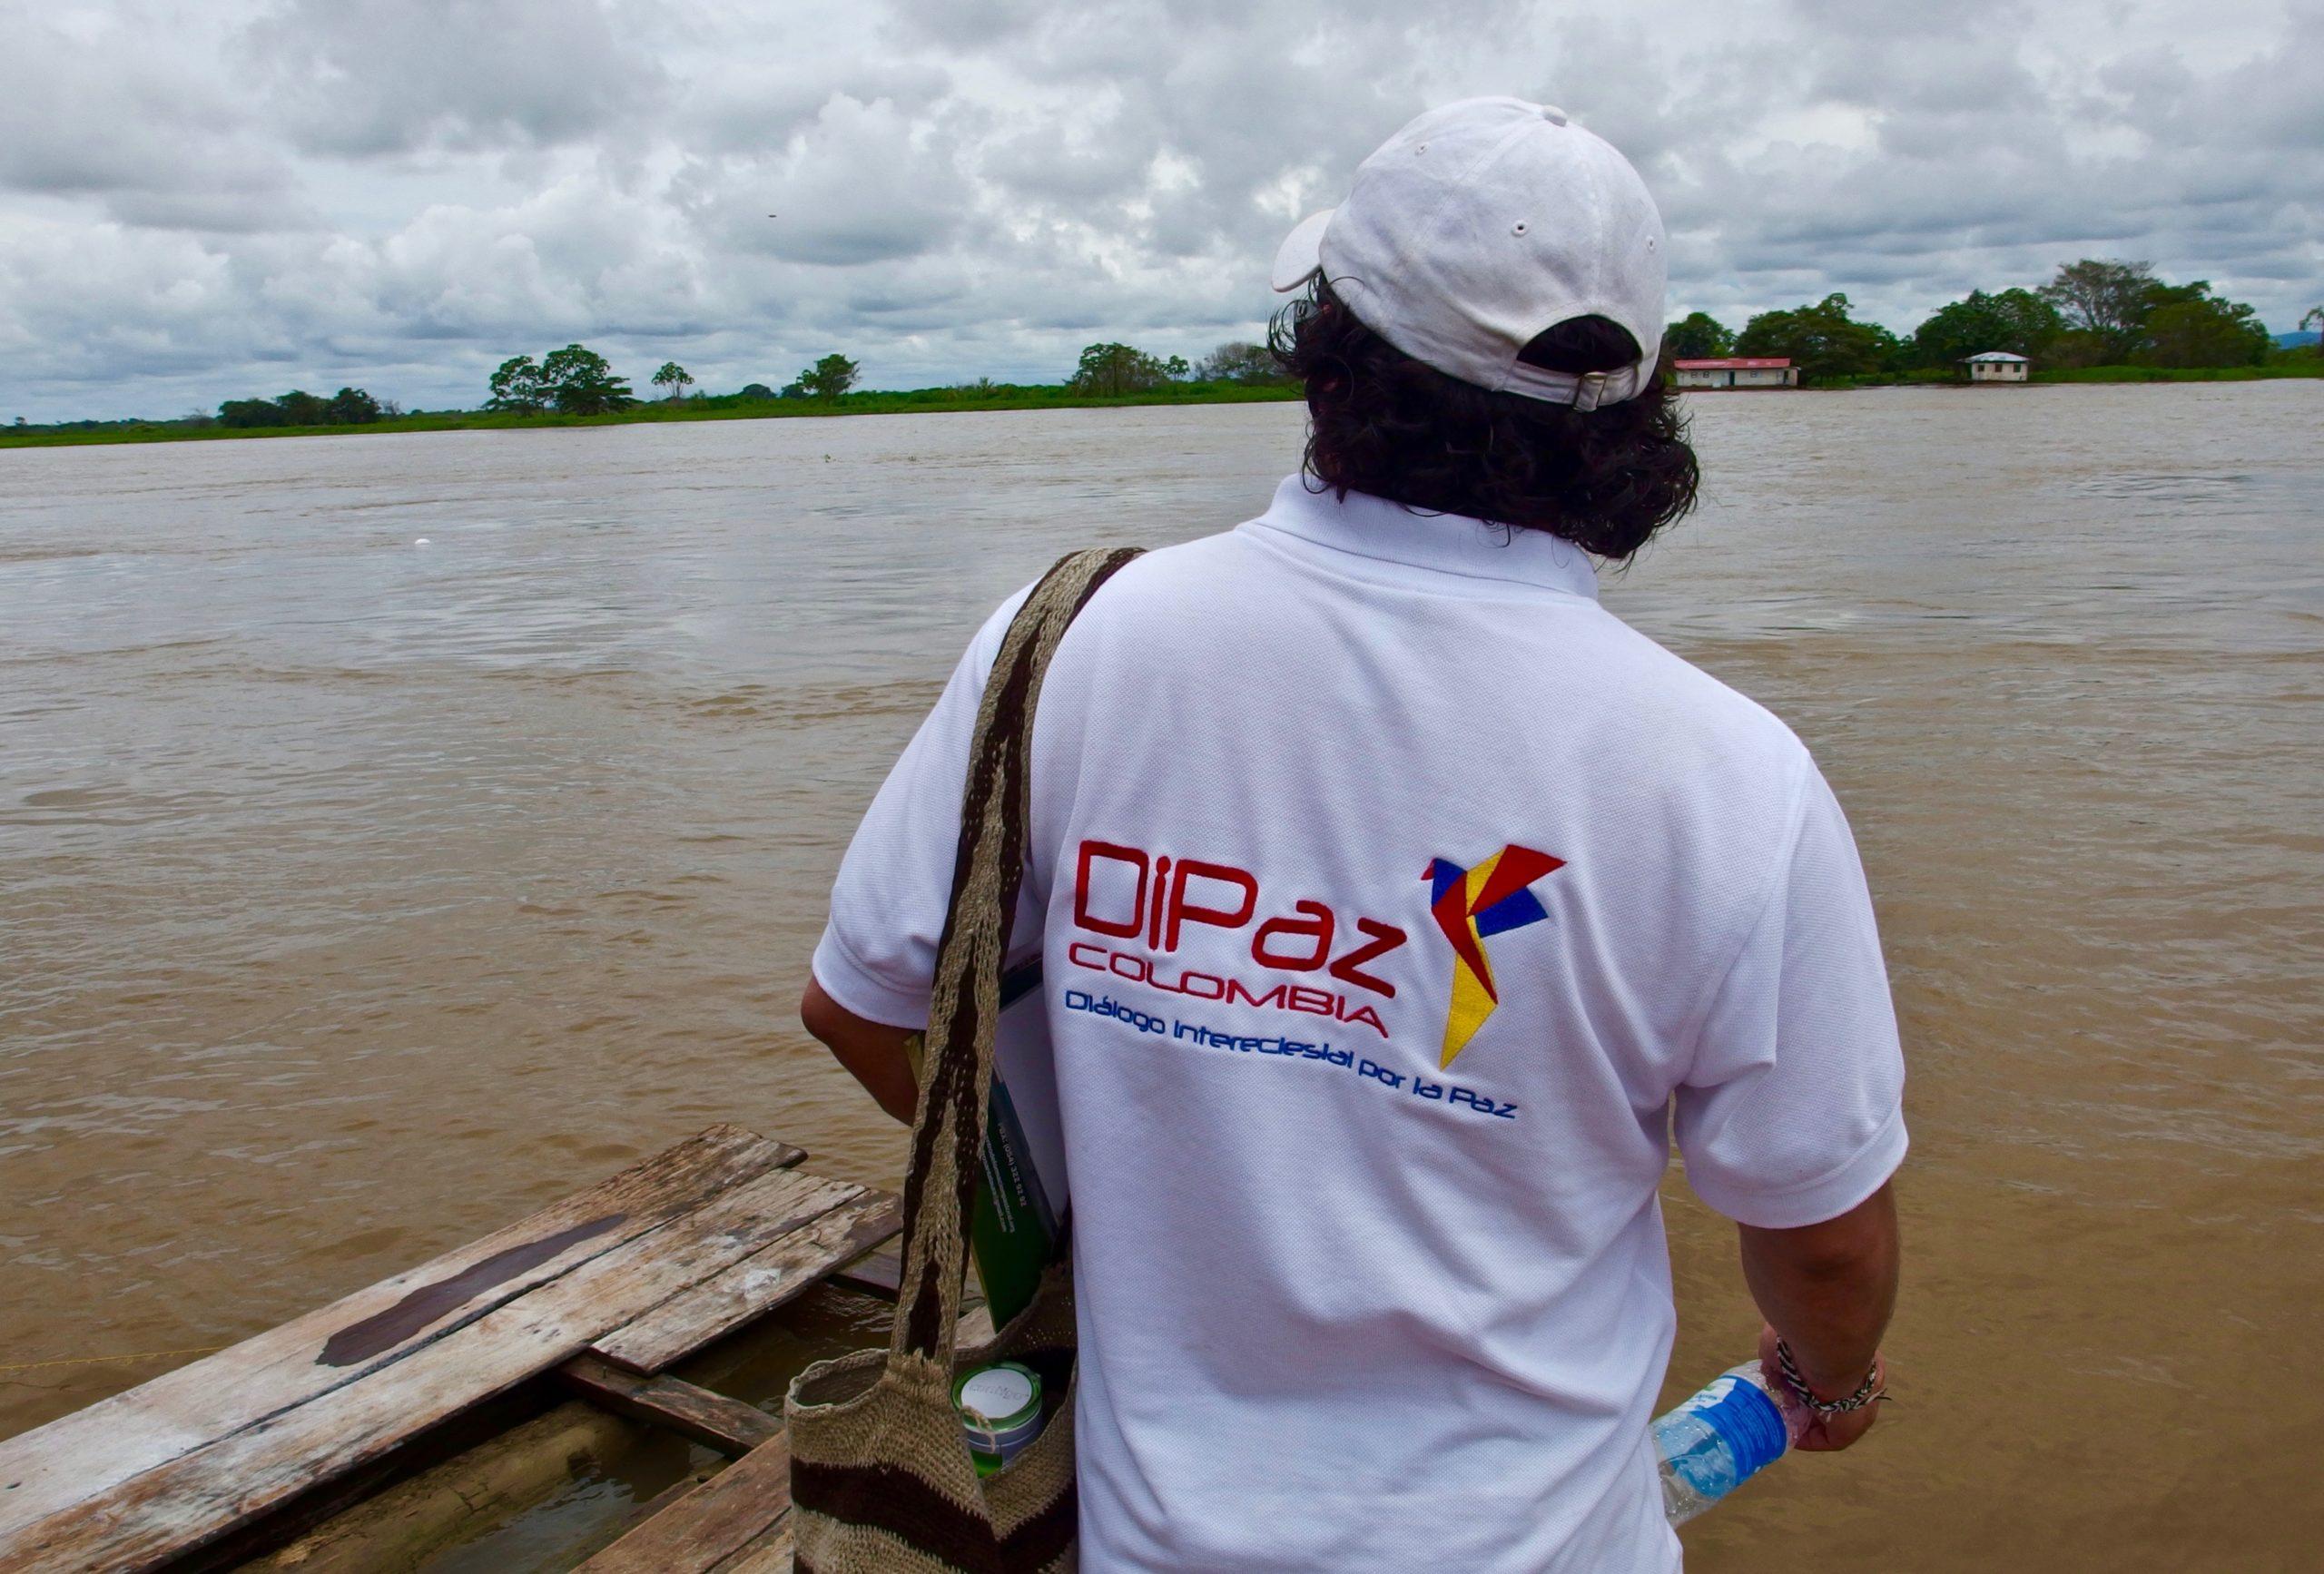 Colombia_Michael_Joseph_P8040364.jpg